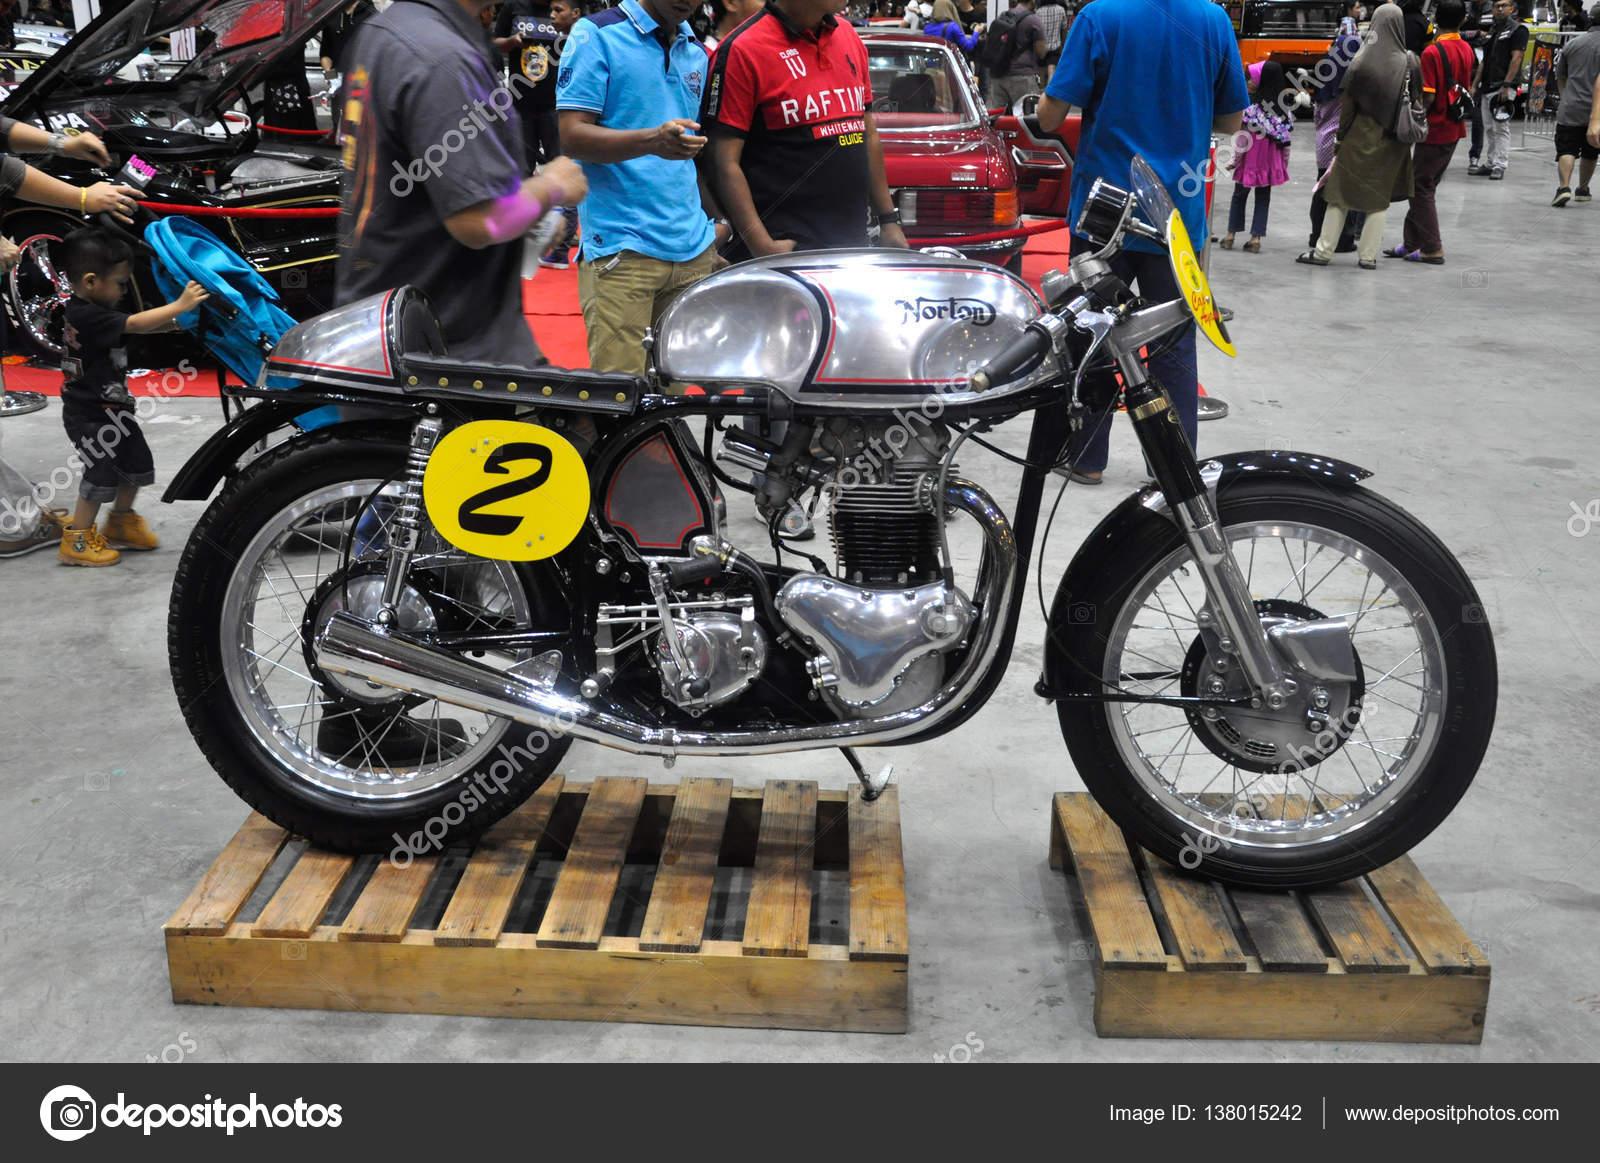 Cafe Racer Malaysia Price